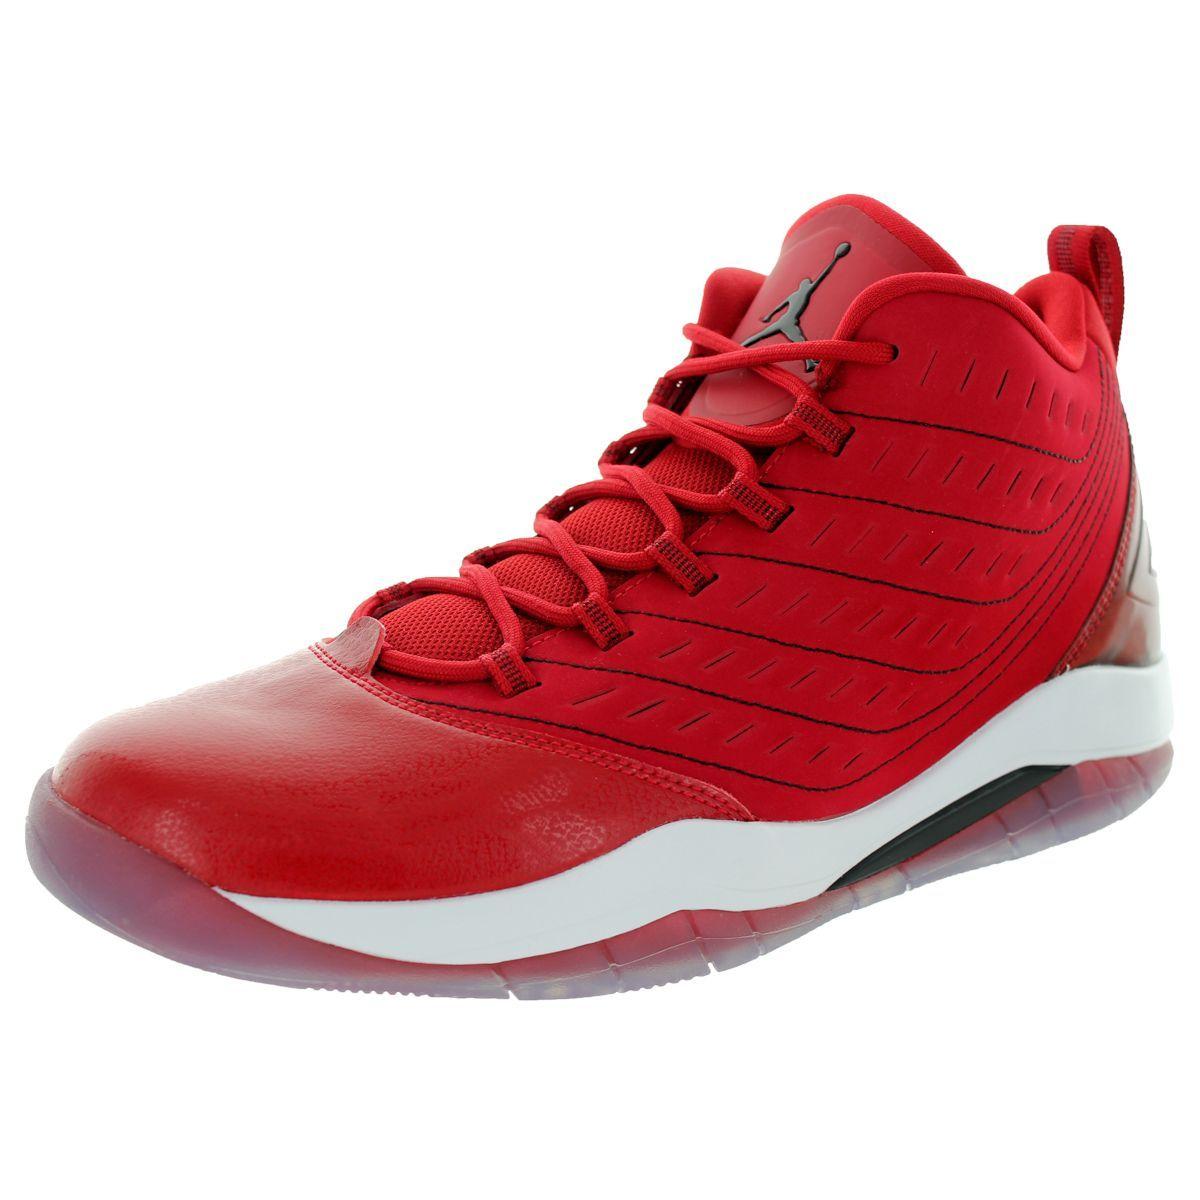 sale retailer f8ff6 c0f59 Nike Jordan Men s Jordan Velocity Gym  Black White White Basketball Shoe